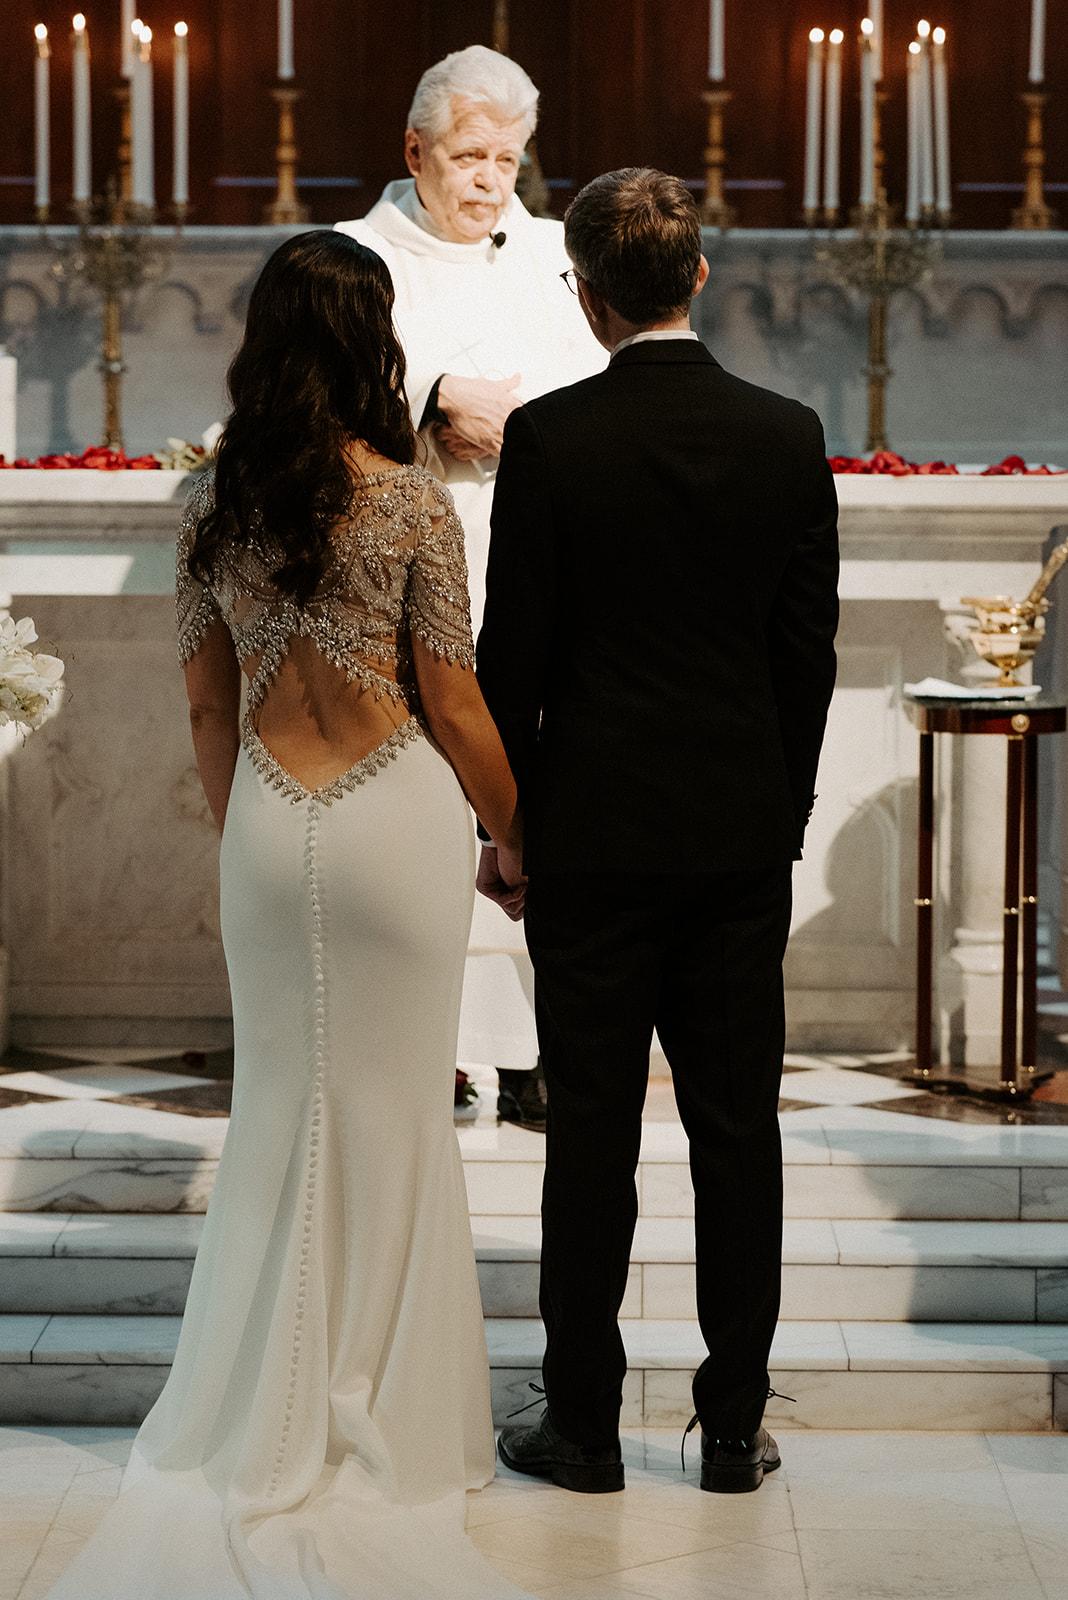 1920's Great Gatsby Inspired Wedding | Our Lady of Good Voyage Wedding | Downtown Boston Wedding | Boston Wedding Photographer